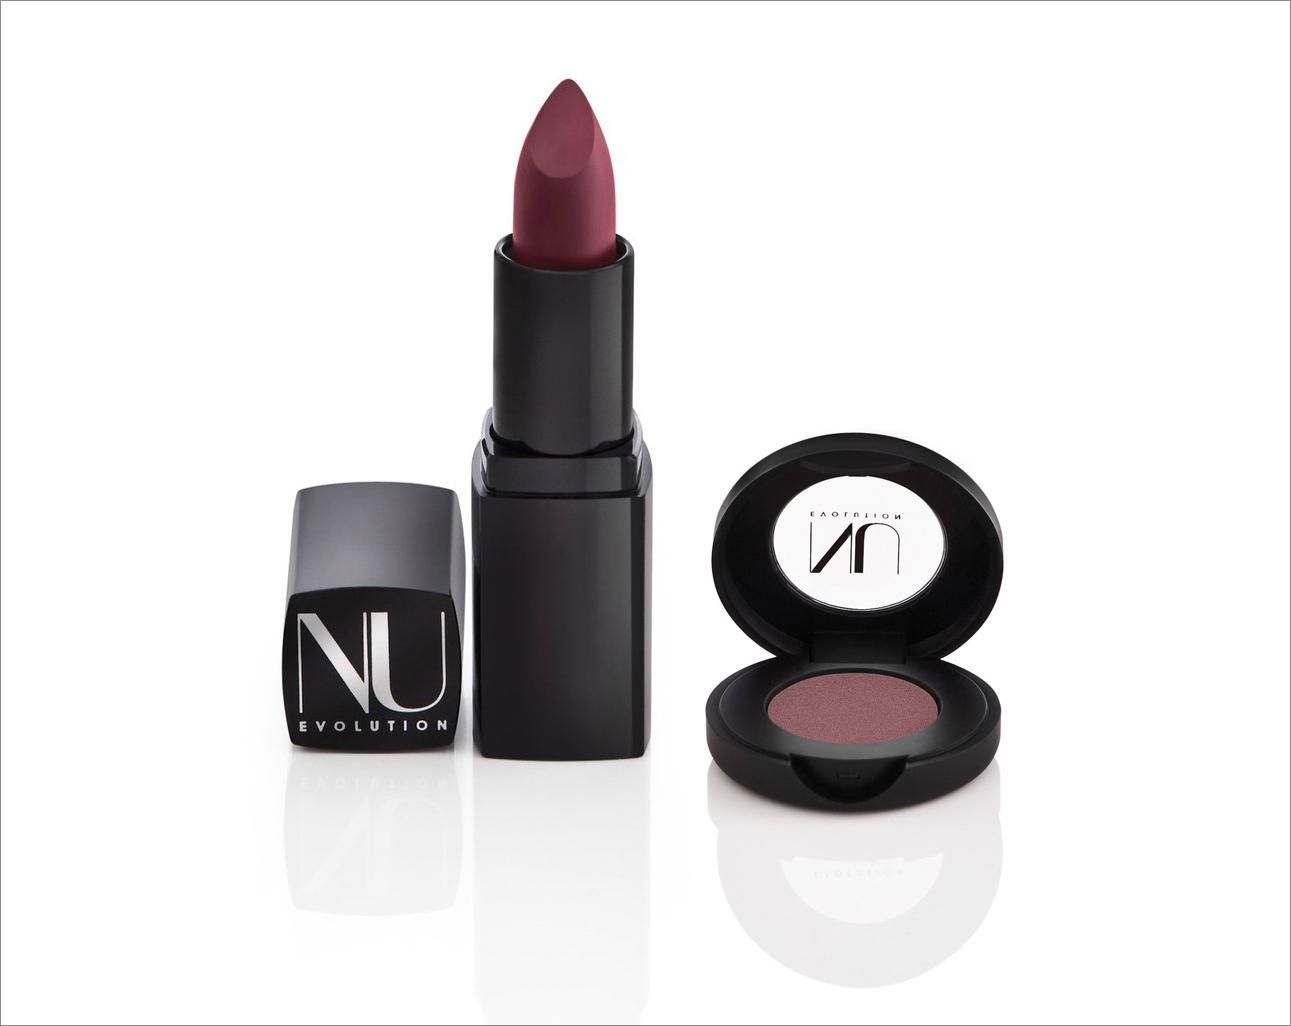 Nu Evolution lipstick and eye shadow dark hues summer beauty